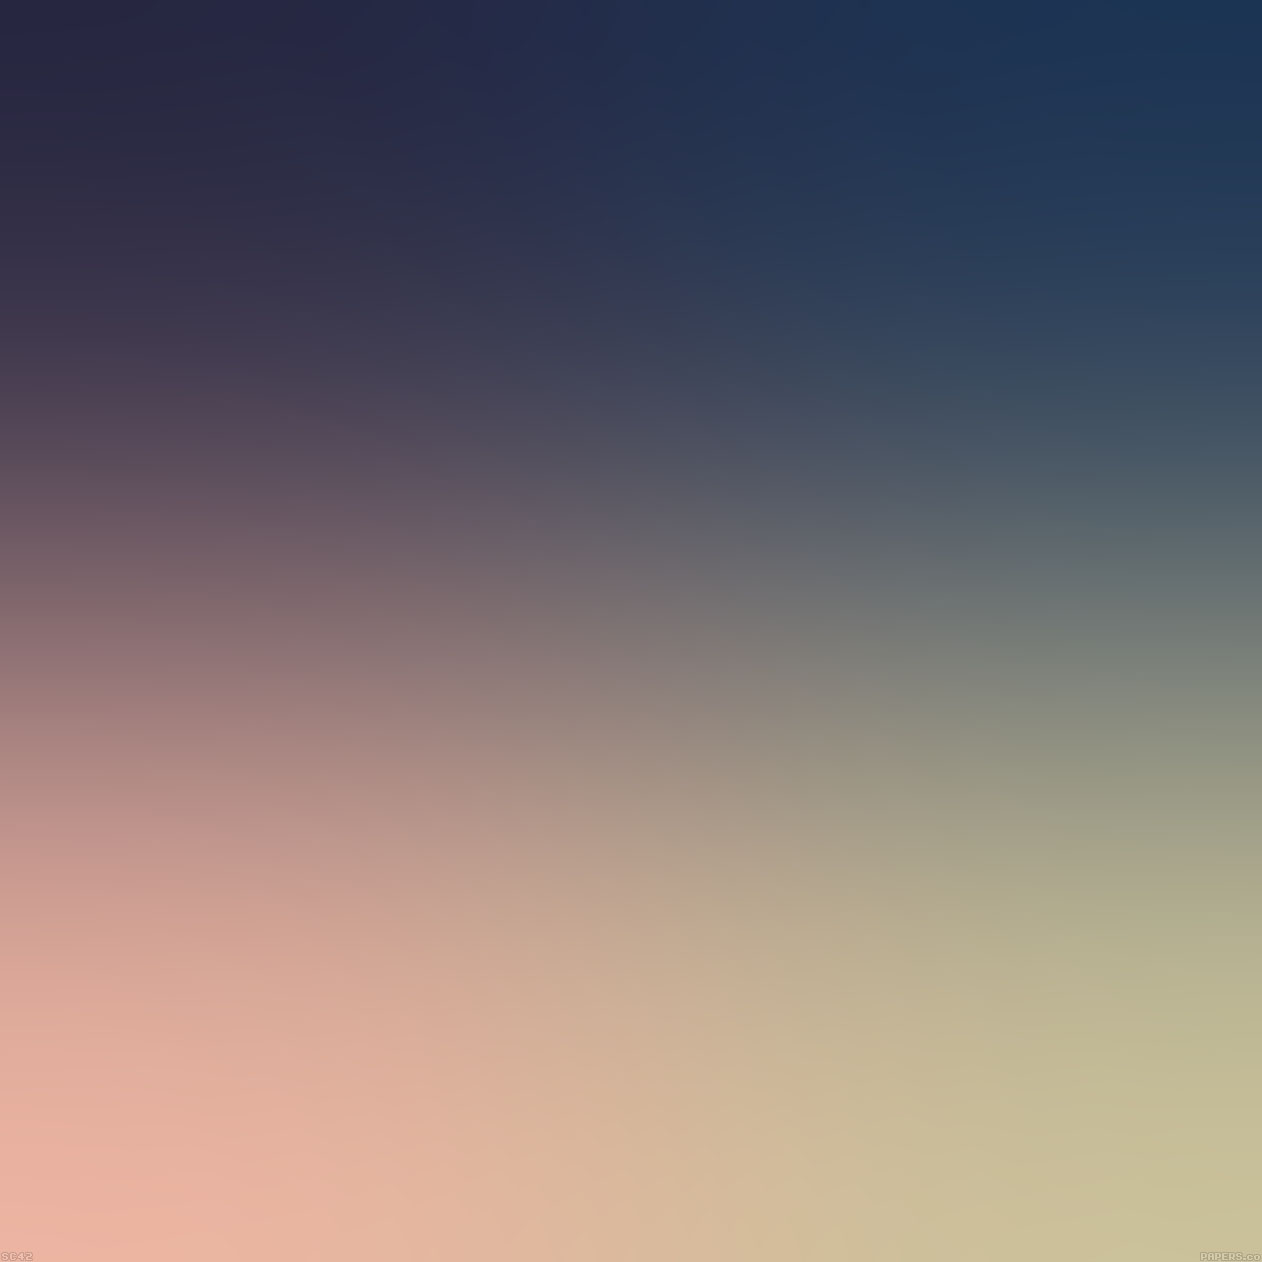 beauty addict iphone wallpaper - photo #44